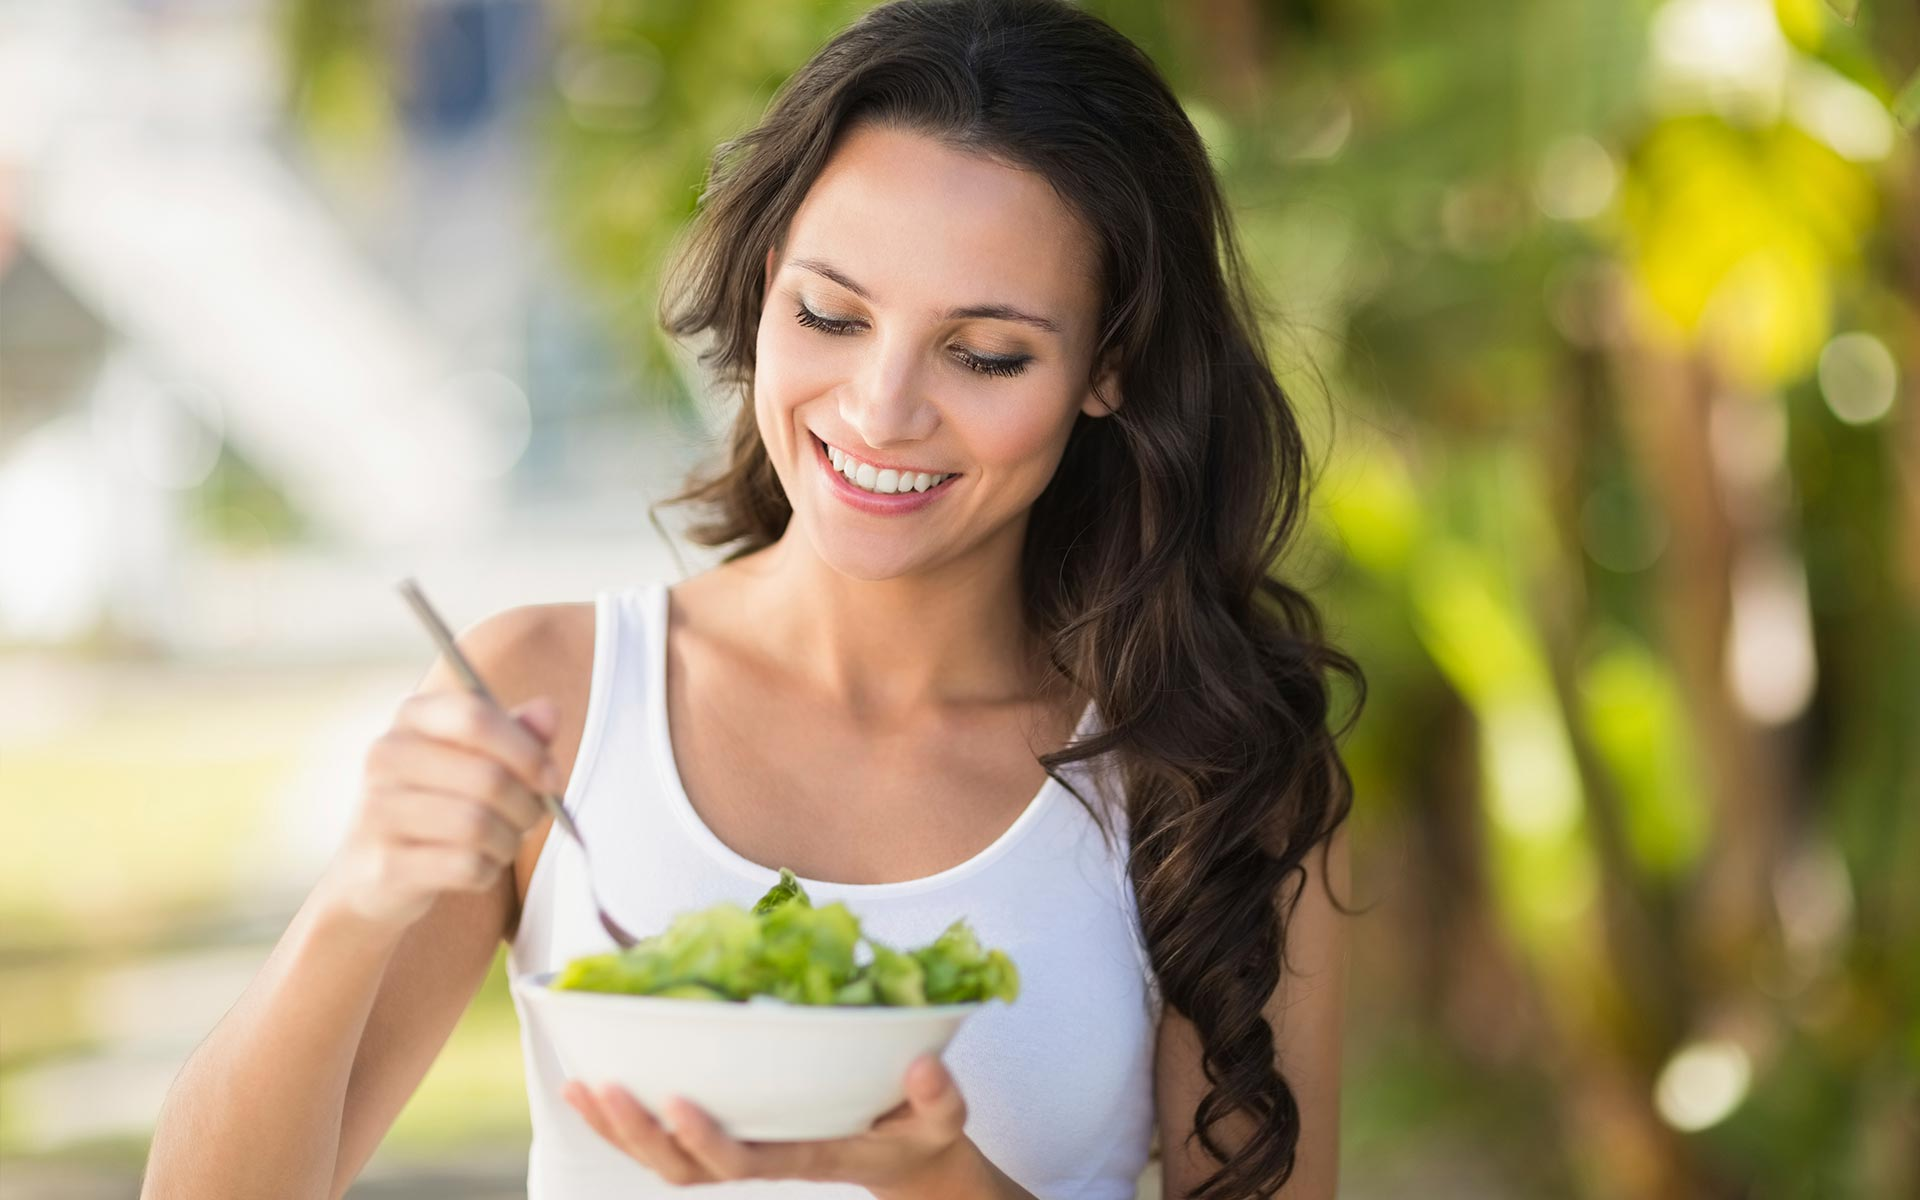 Sustentabilidade: nosso ingrediente